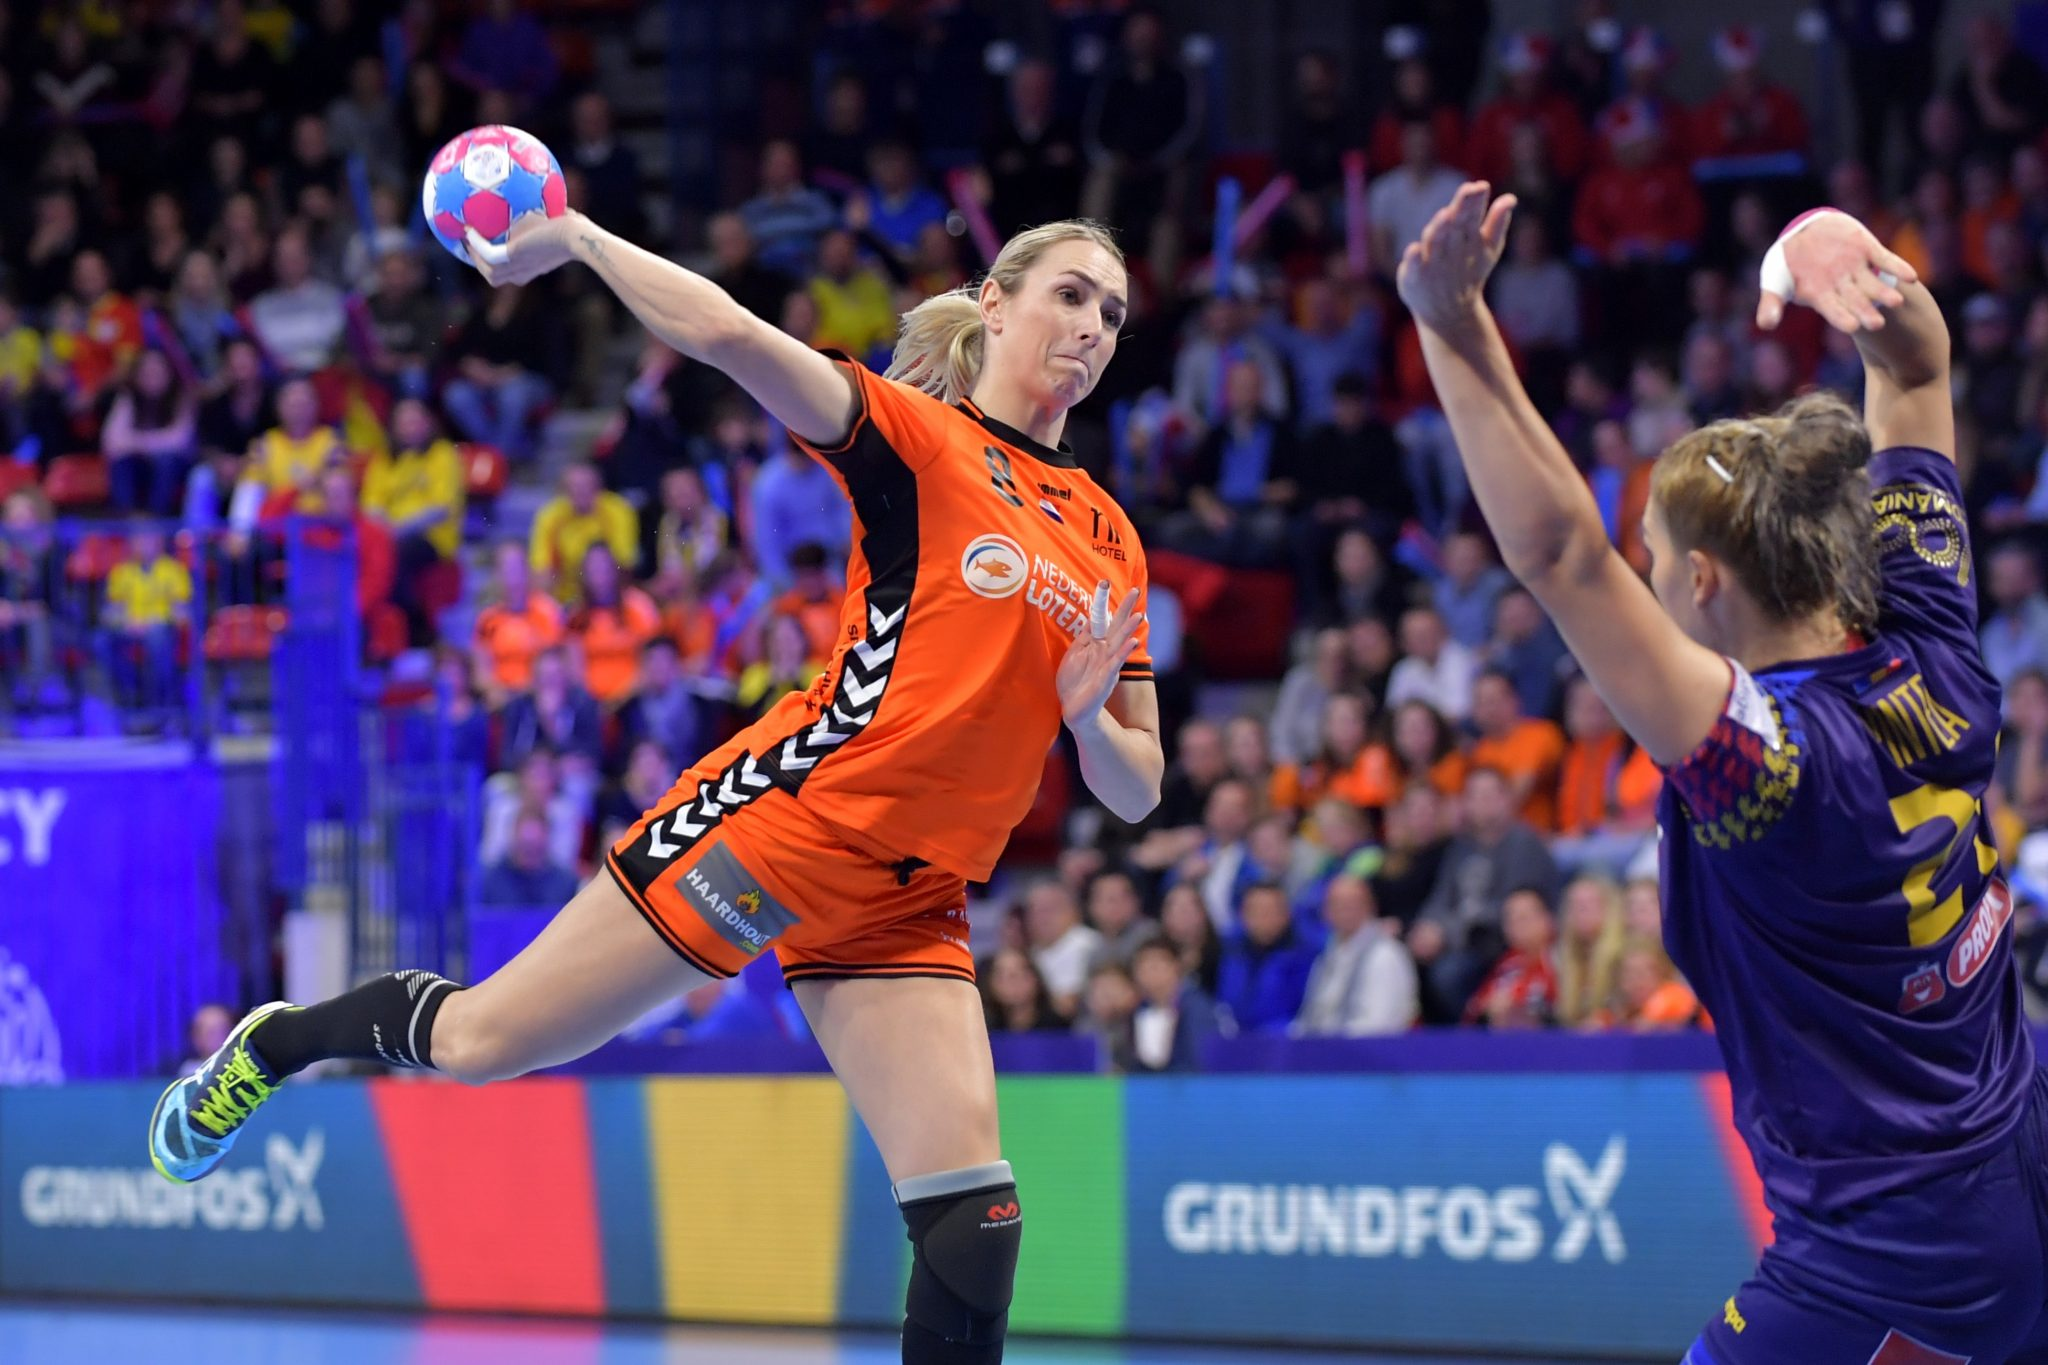 09-12-2018: Handbal: Vrouwen Nederland V Roemenie: Nancy EK Handbal In Frankrijk, Hoofdronde Groep II Nederland - Roemenie Lois Abbingh #8 NED